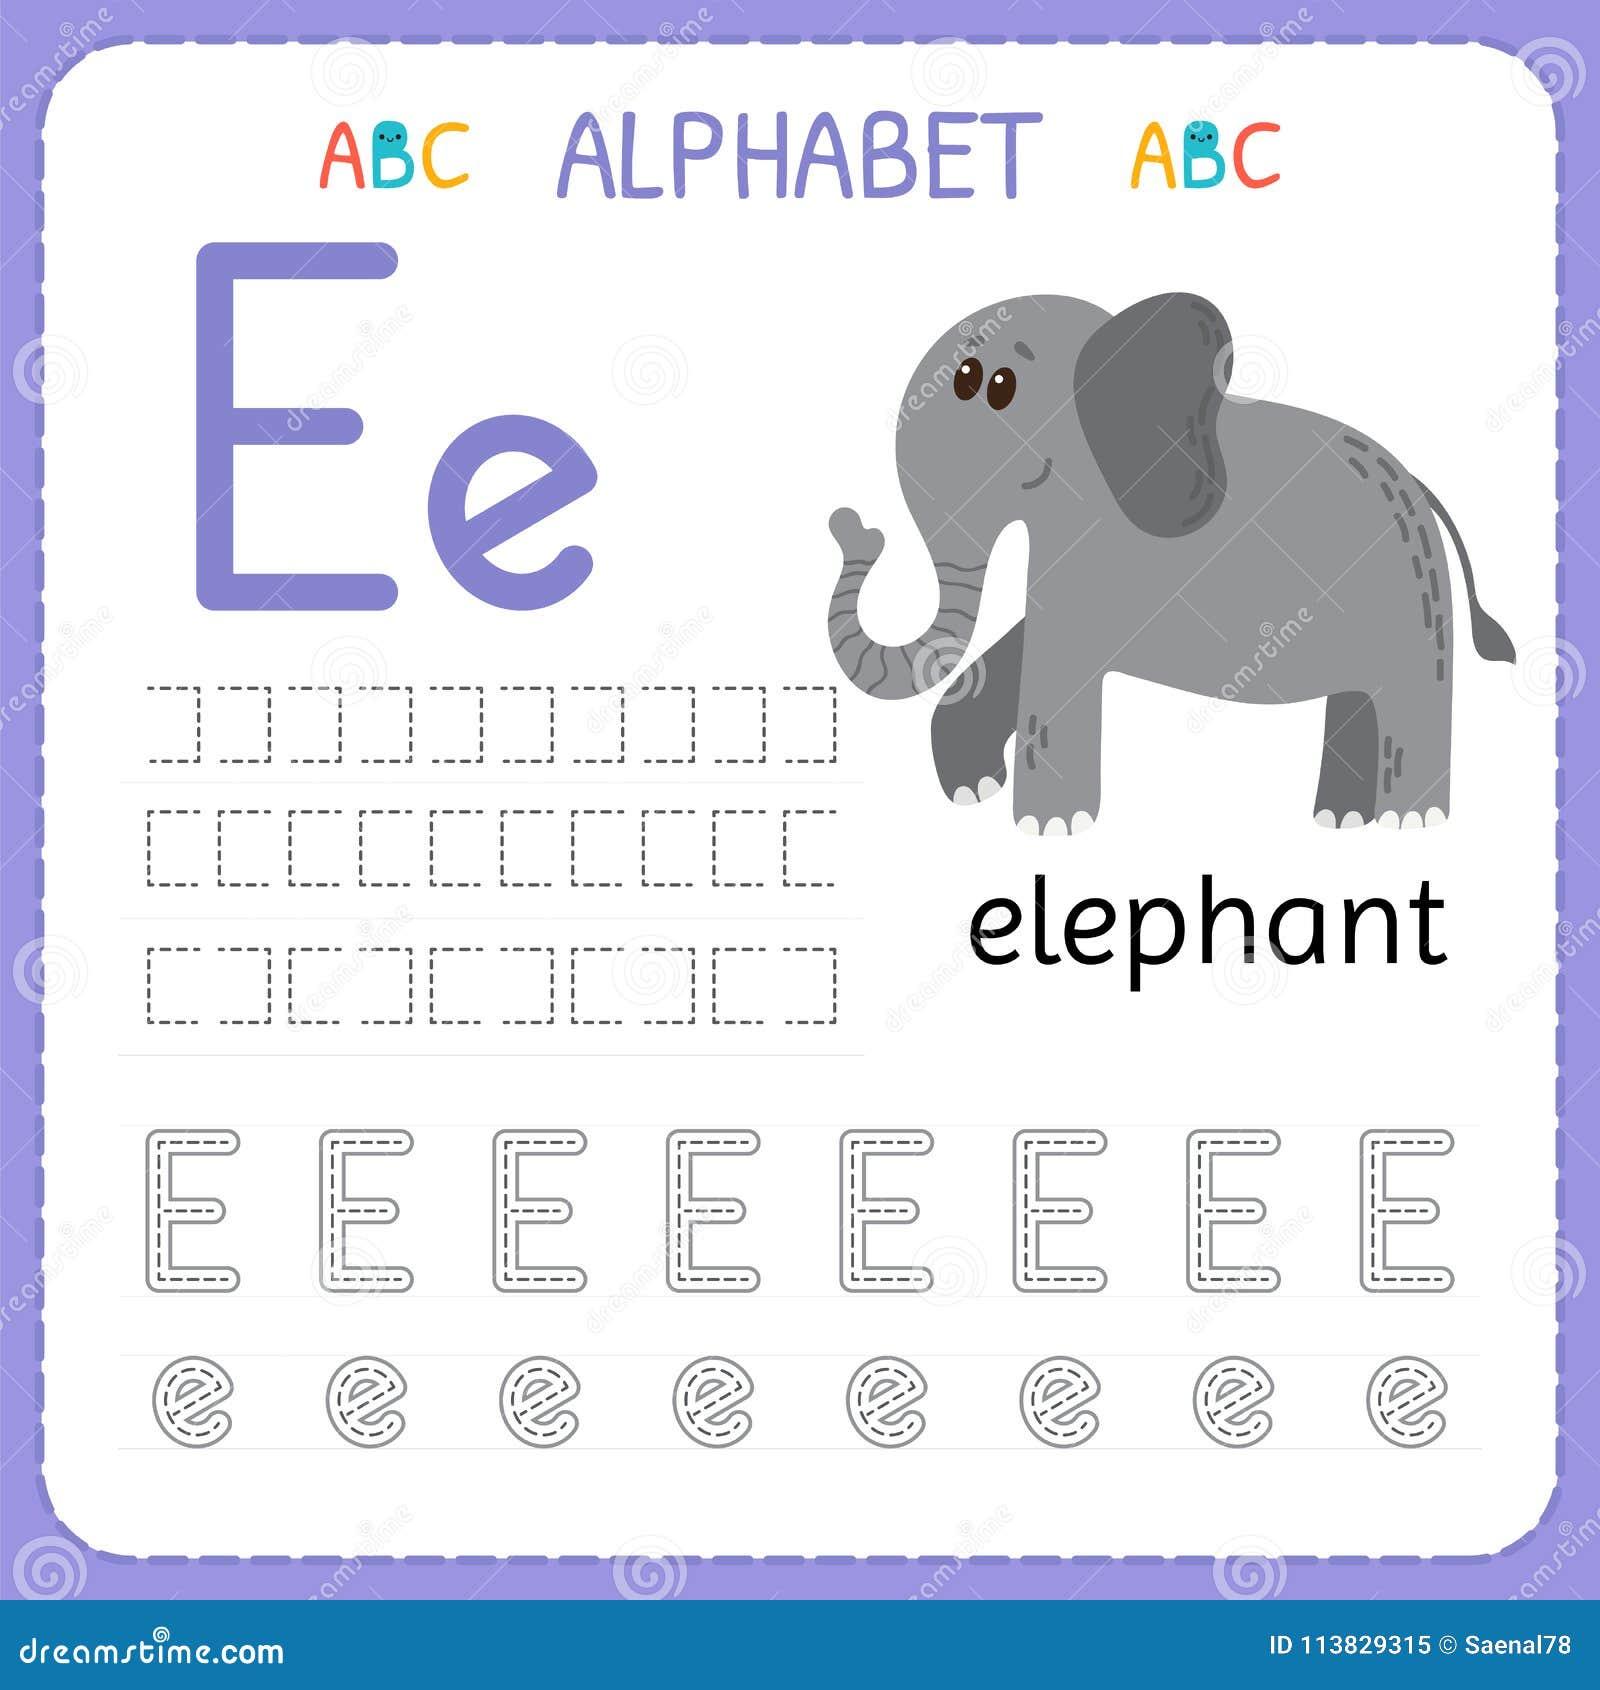 download alphabet tracing worksheet for preschool and kindergarten writing practice letter e exercises for